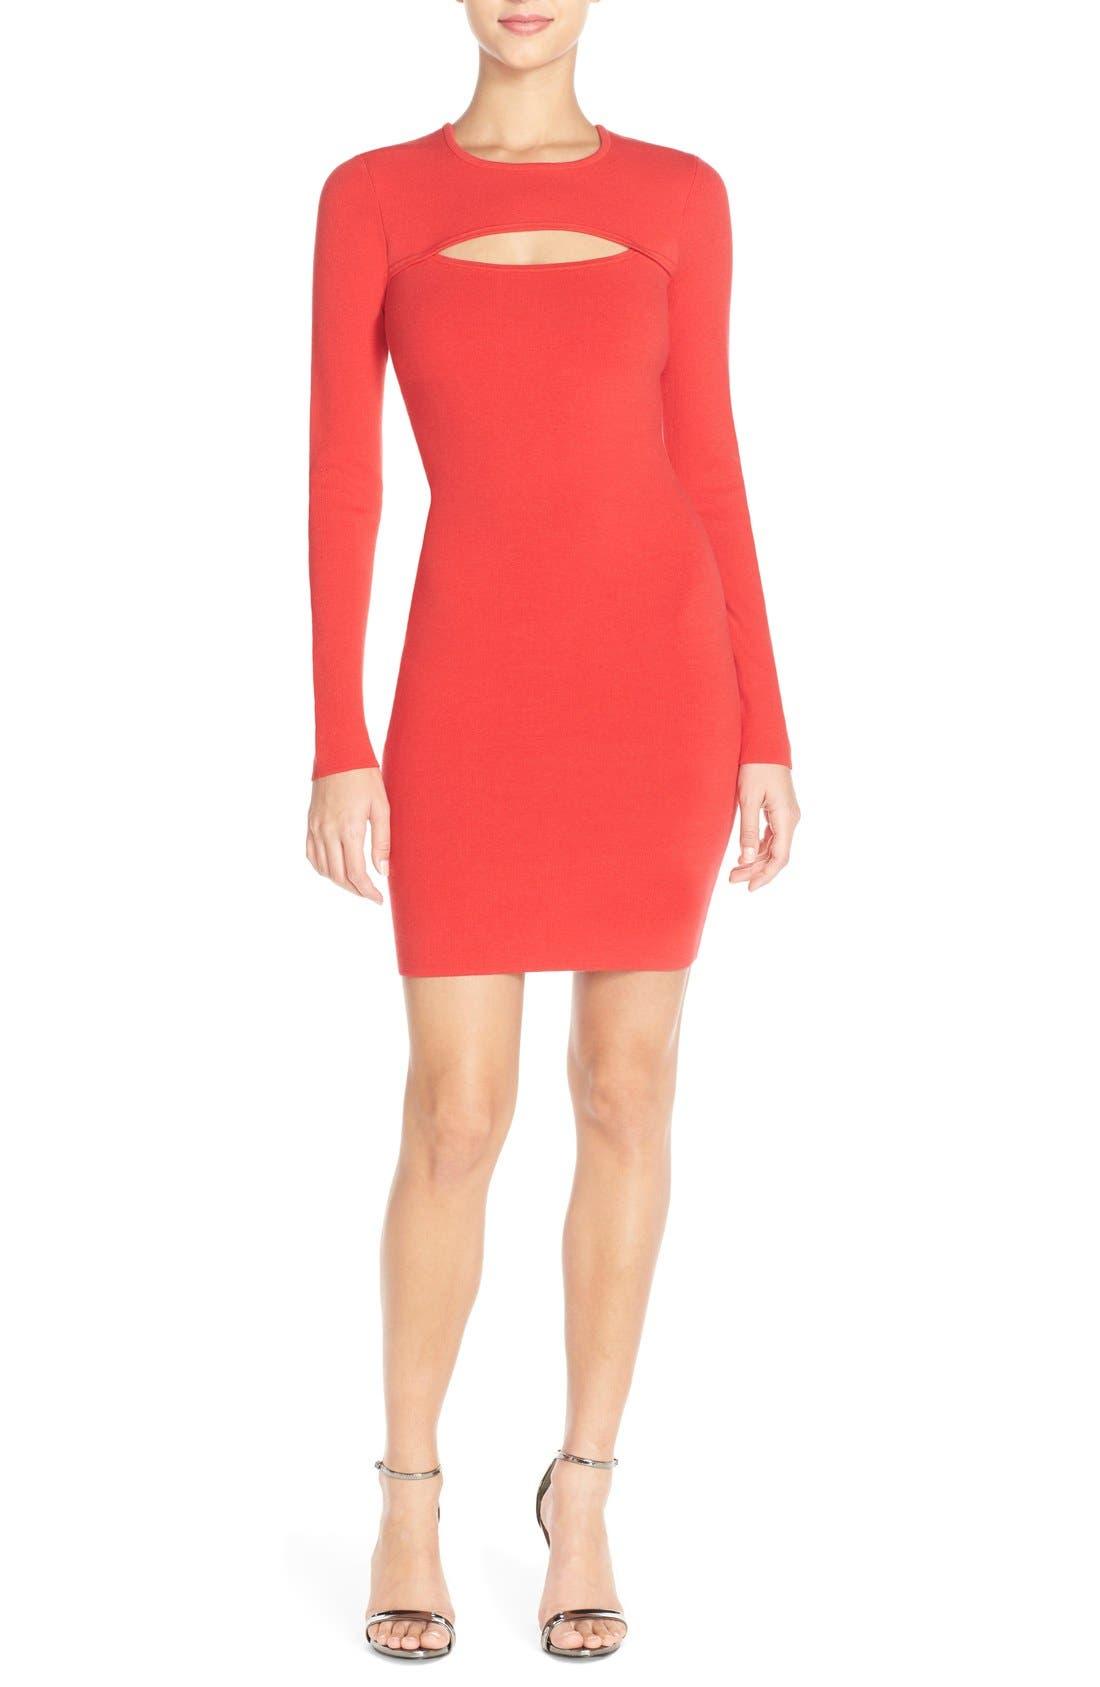 Alternate Image 1 Selected - BCBGMAXAZRIA 'Fyonna' Cutout Sweater Body-Con Dress